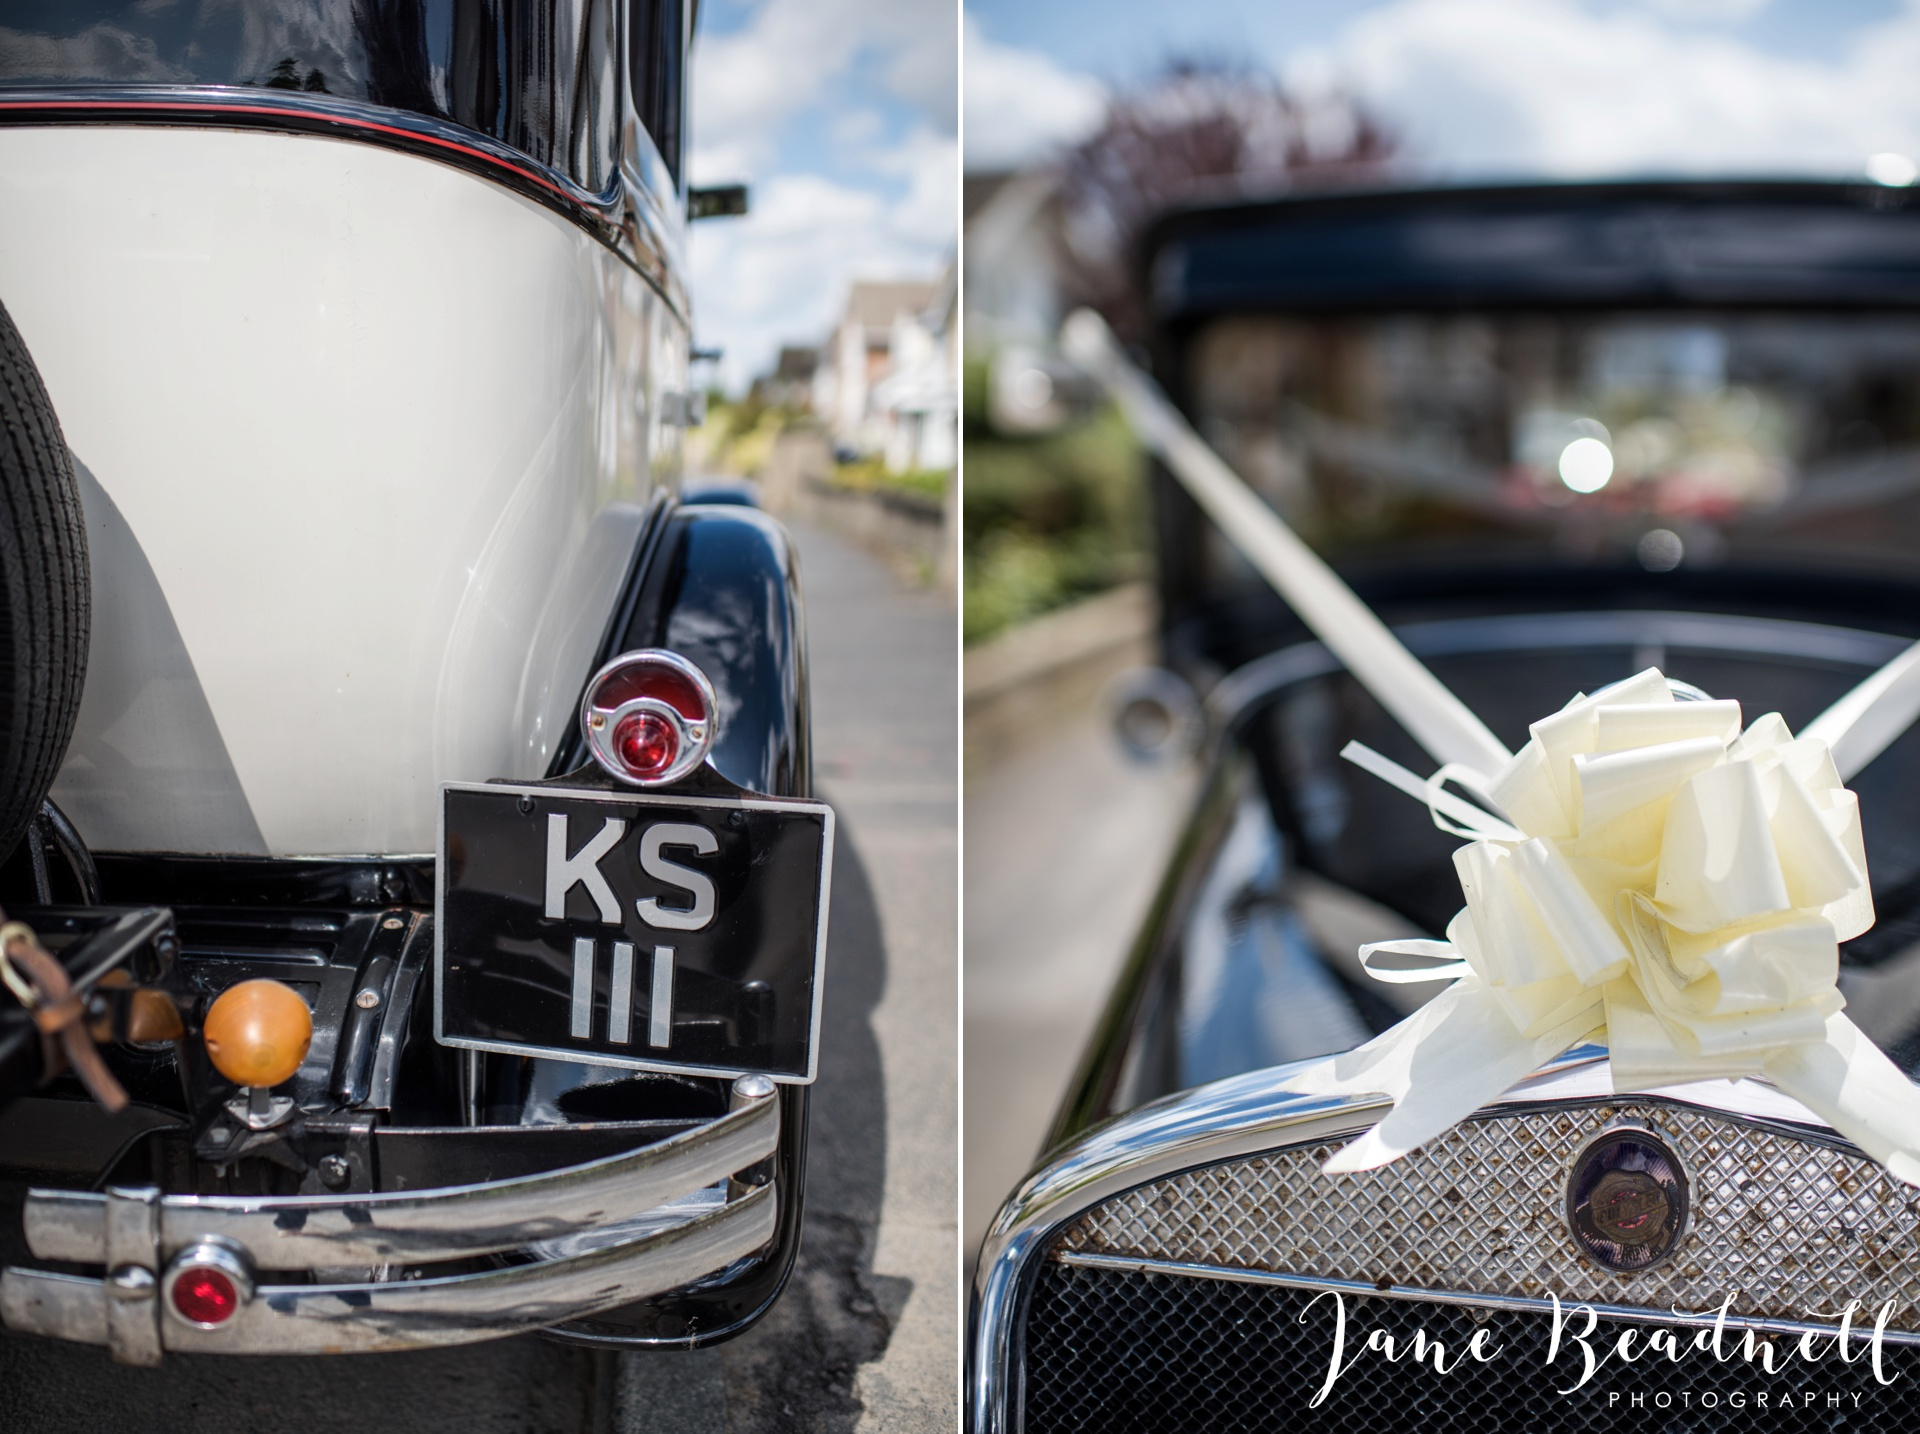 yorkshire-fine-art-wedding-photographer-jane-beadnell-photography-poppleton-york_0002